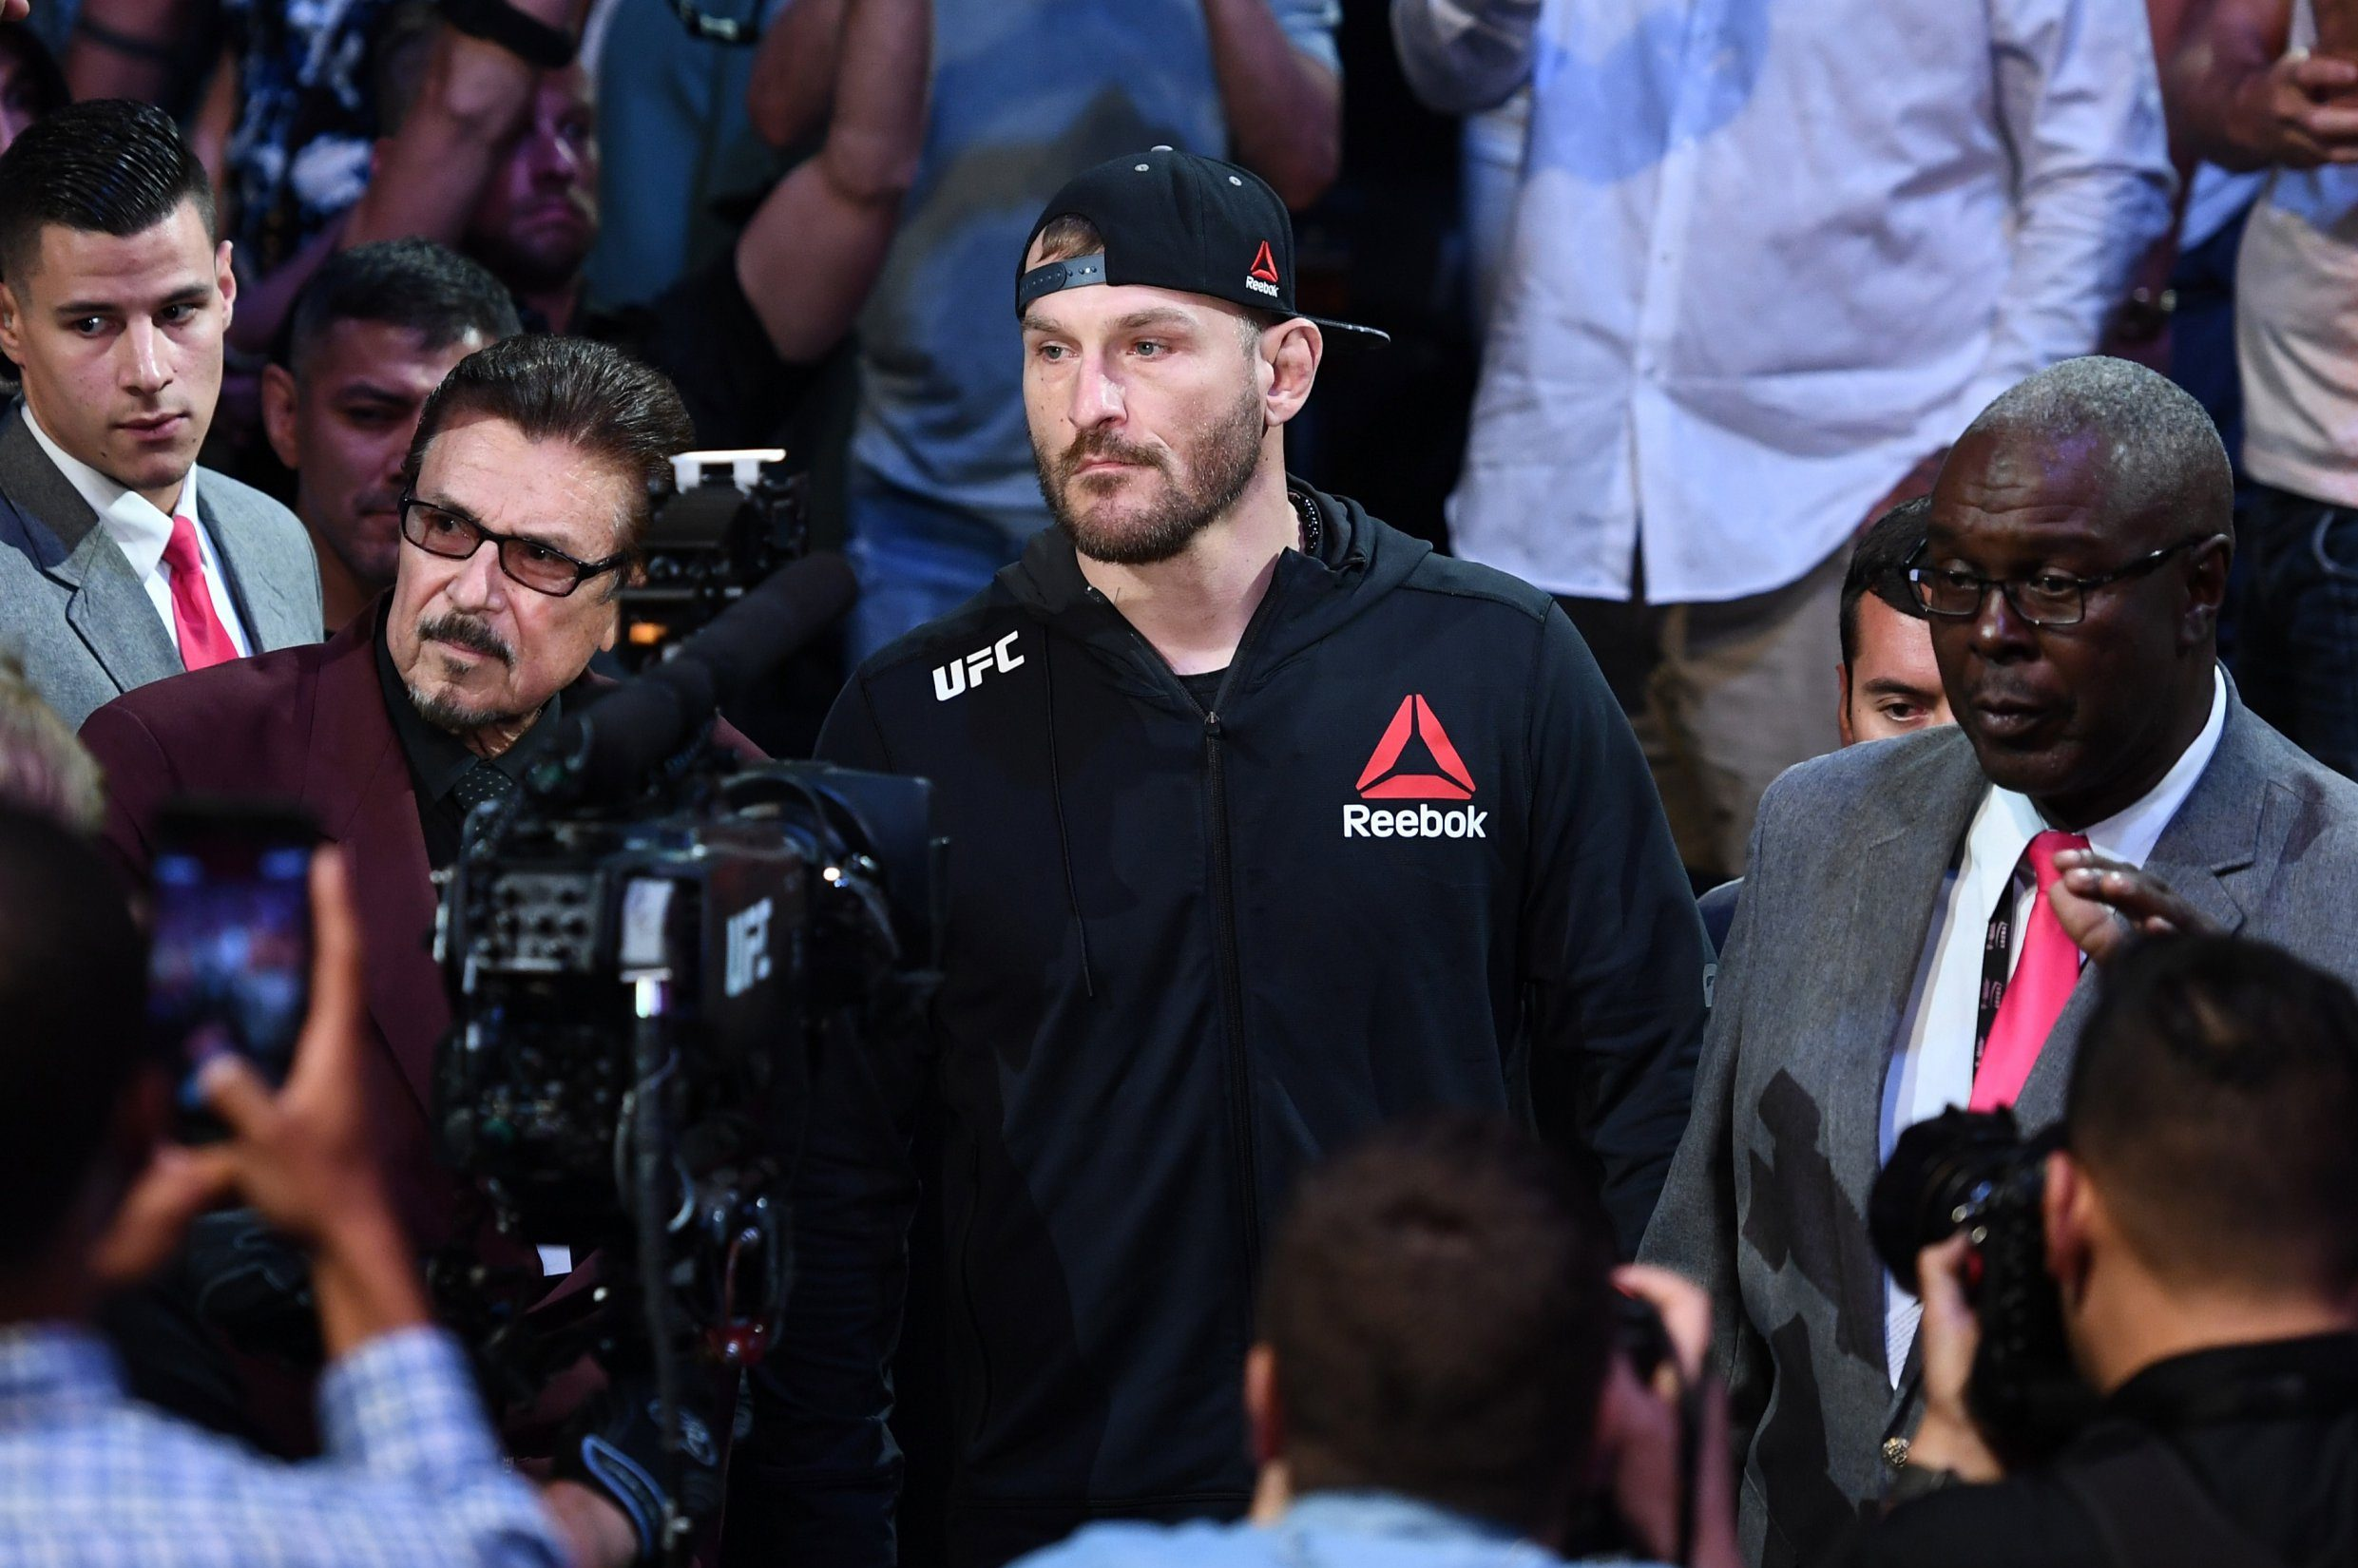 Stipe Miocic slams Daniel Cormier vs Brock Lesnar: A s*** show